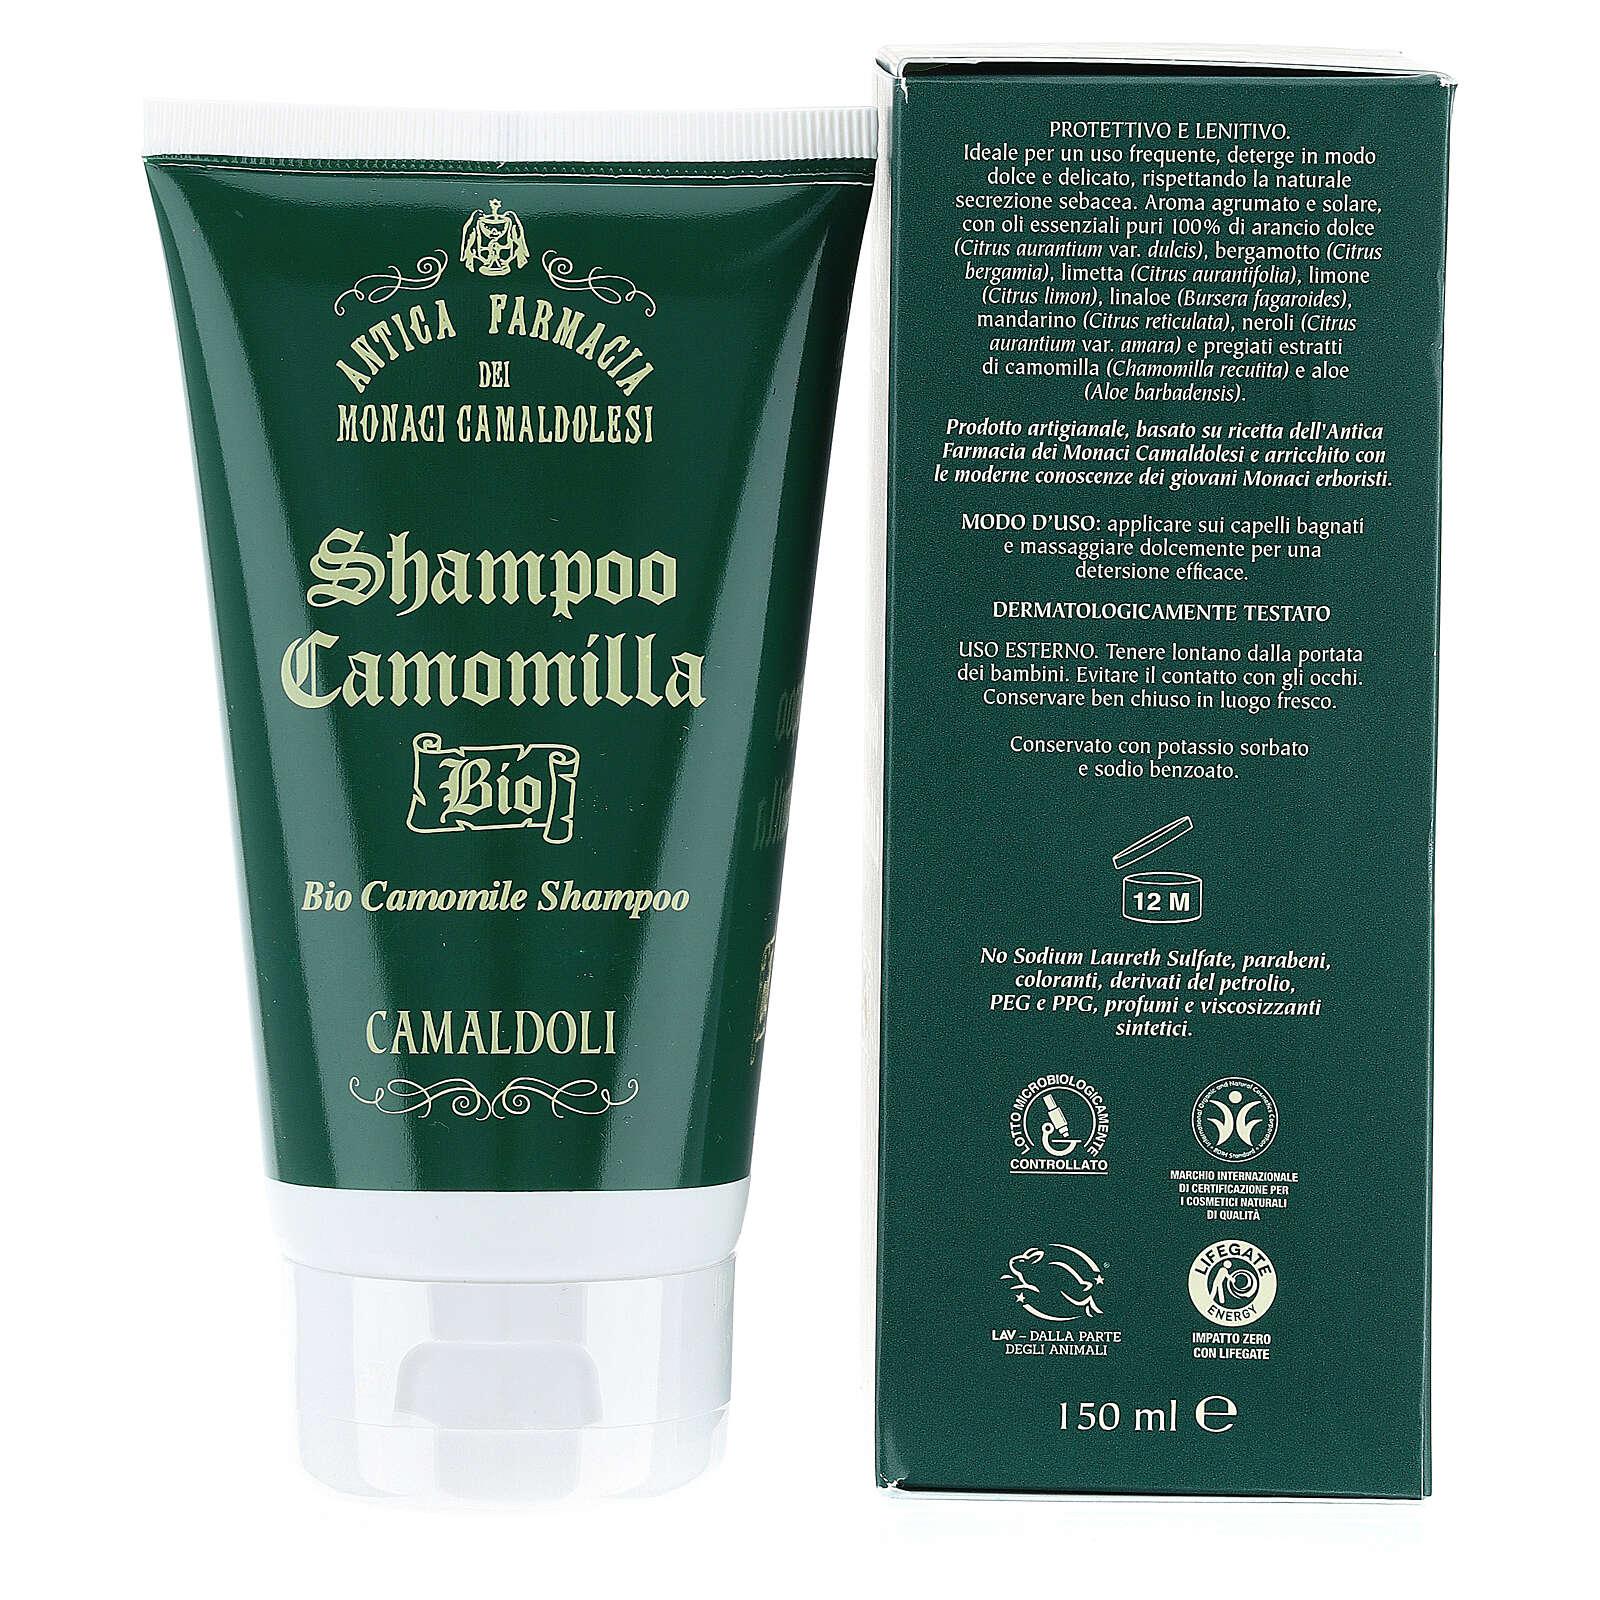 Camaldoli BDIH organic Camomile Shampoo 150 ml 4